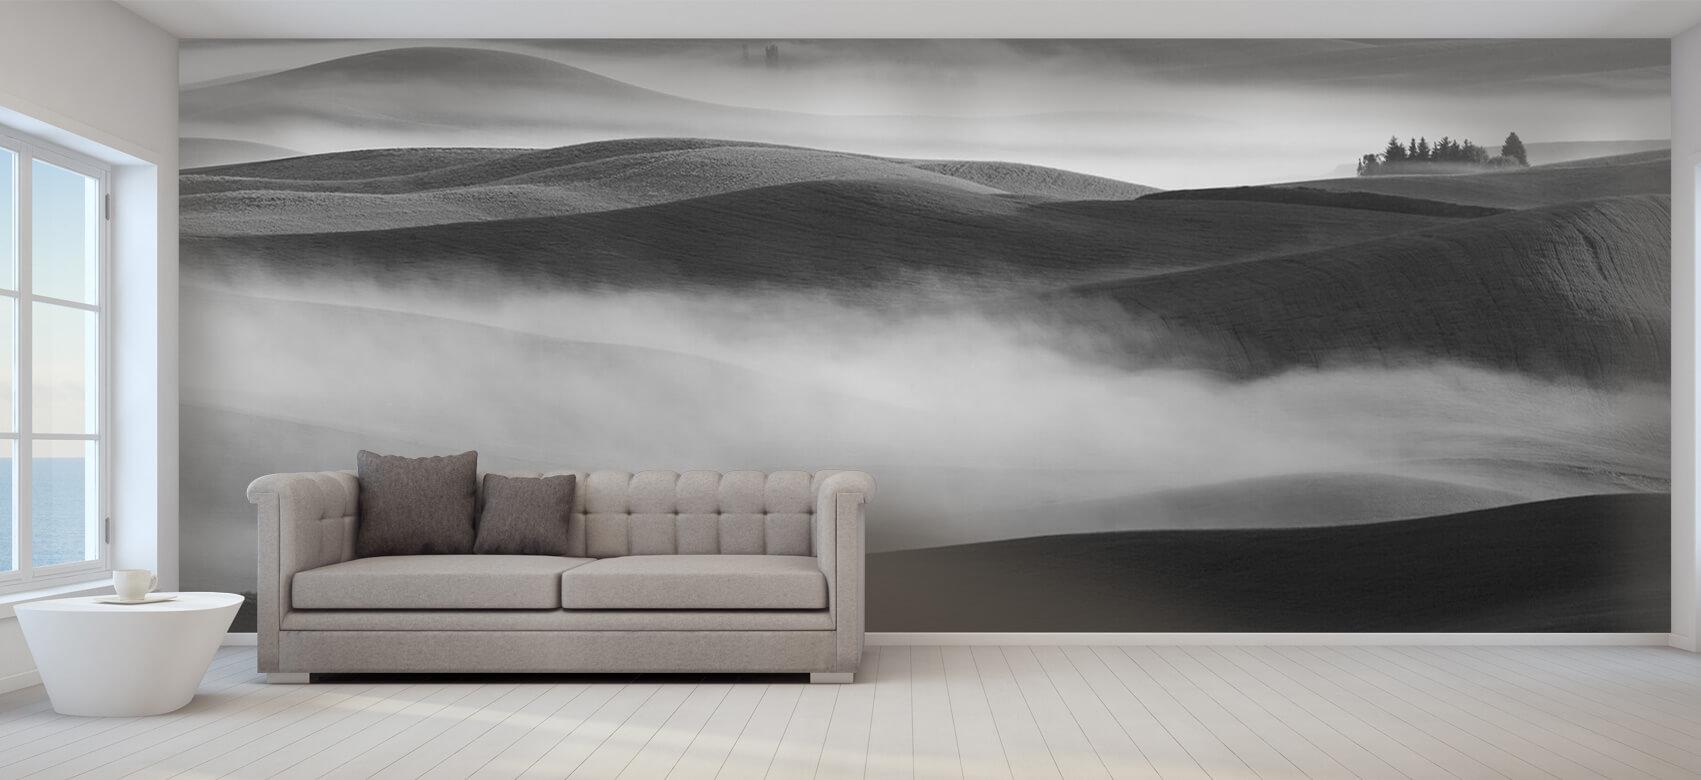 Landschap Dream Land in Morning Mist 9